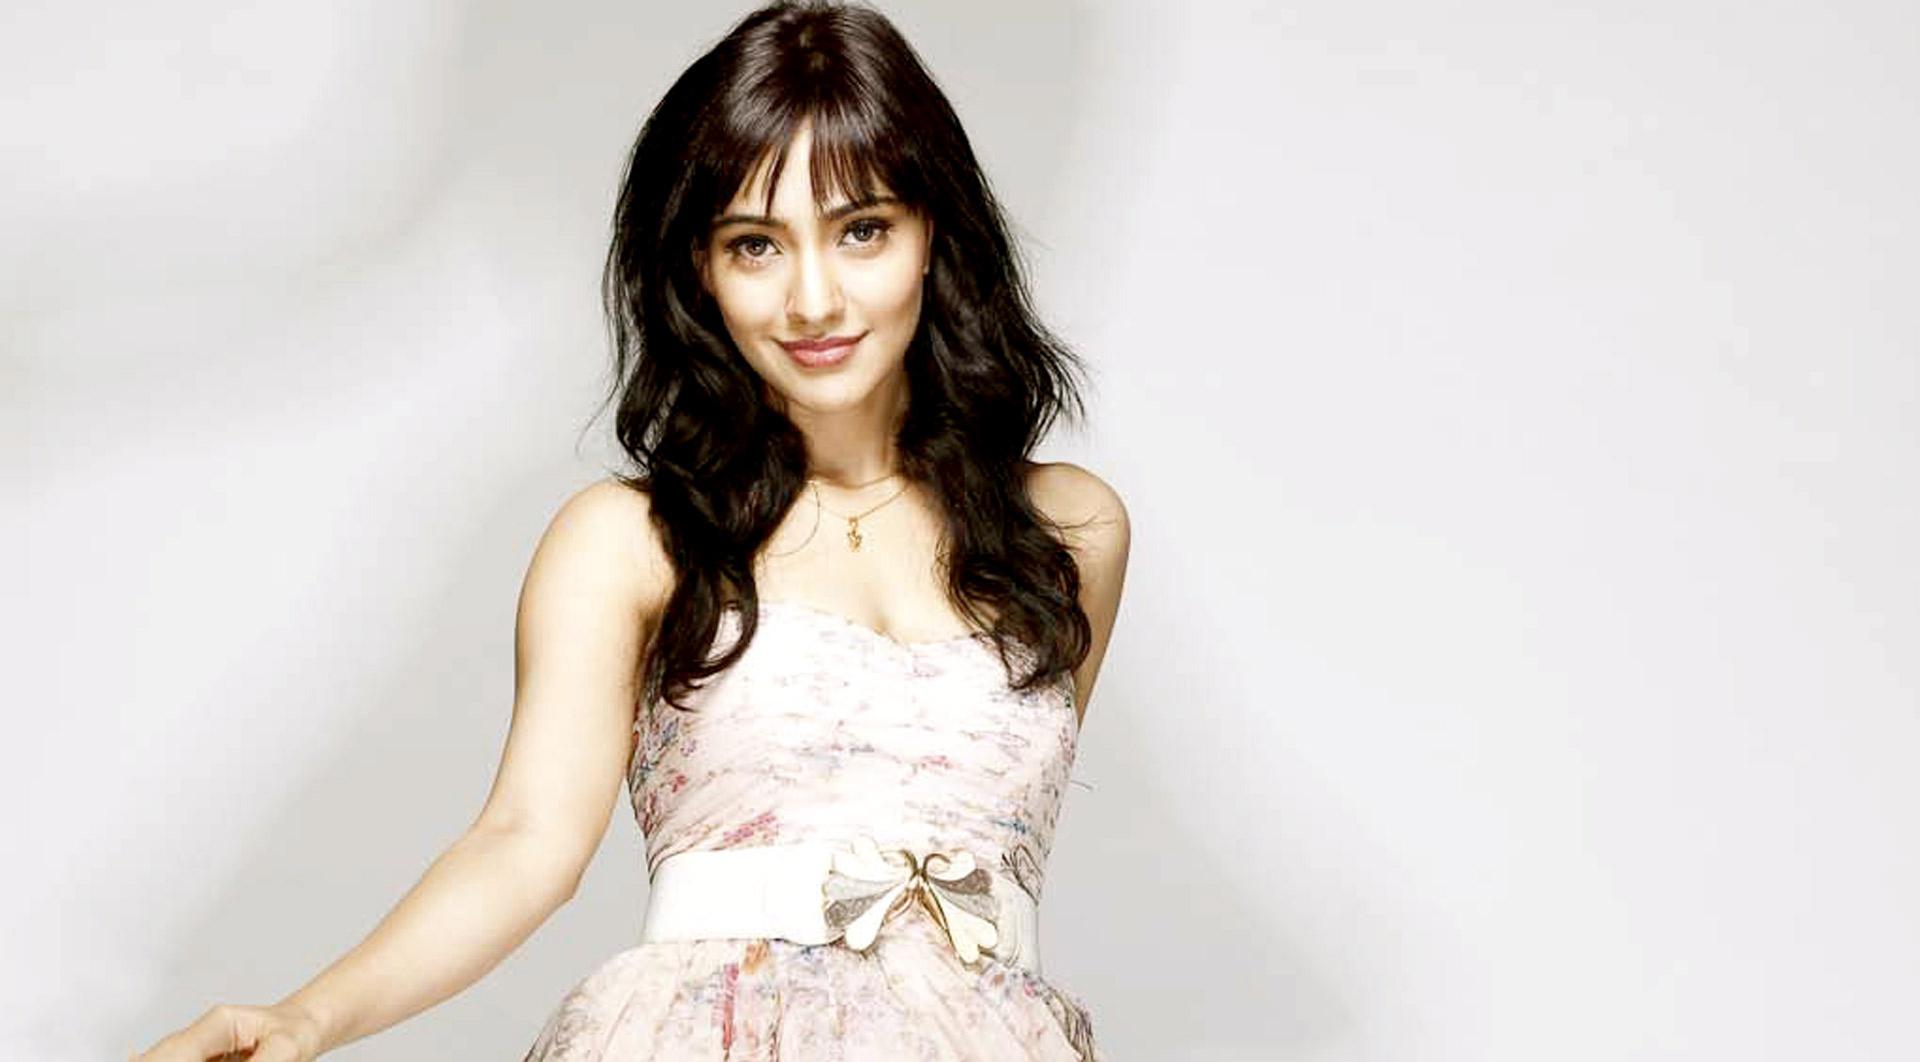 Download Neha Sharma Cute Photoshoot 1080x1920 Resolution Full HD